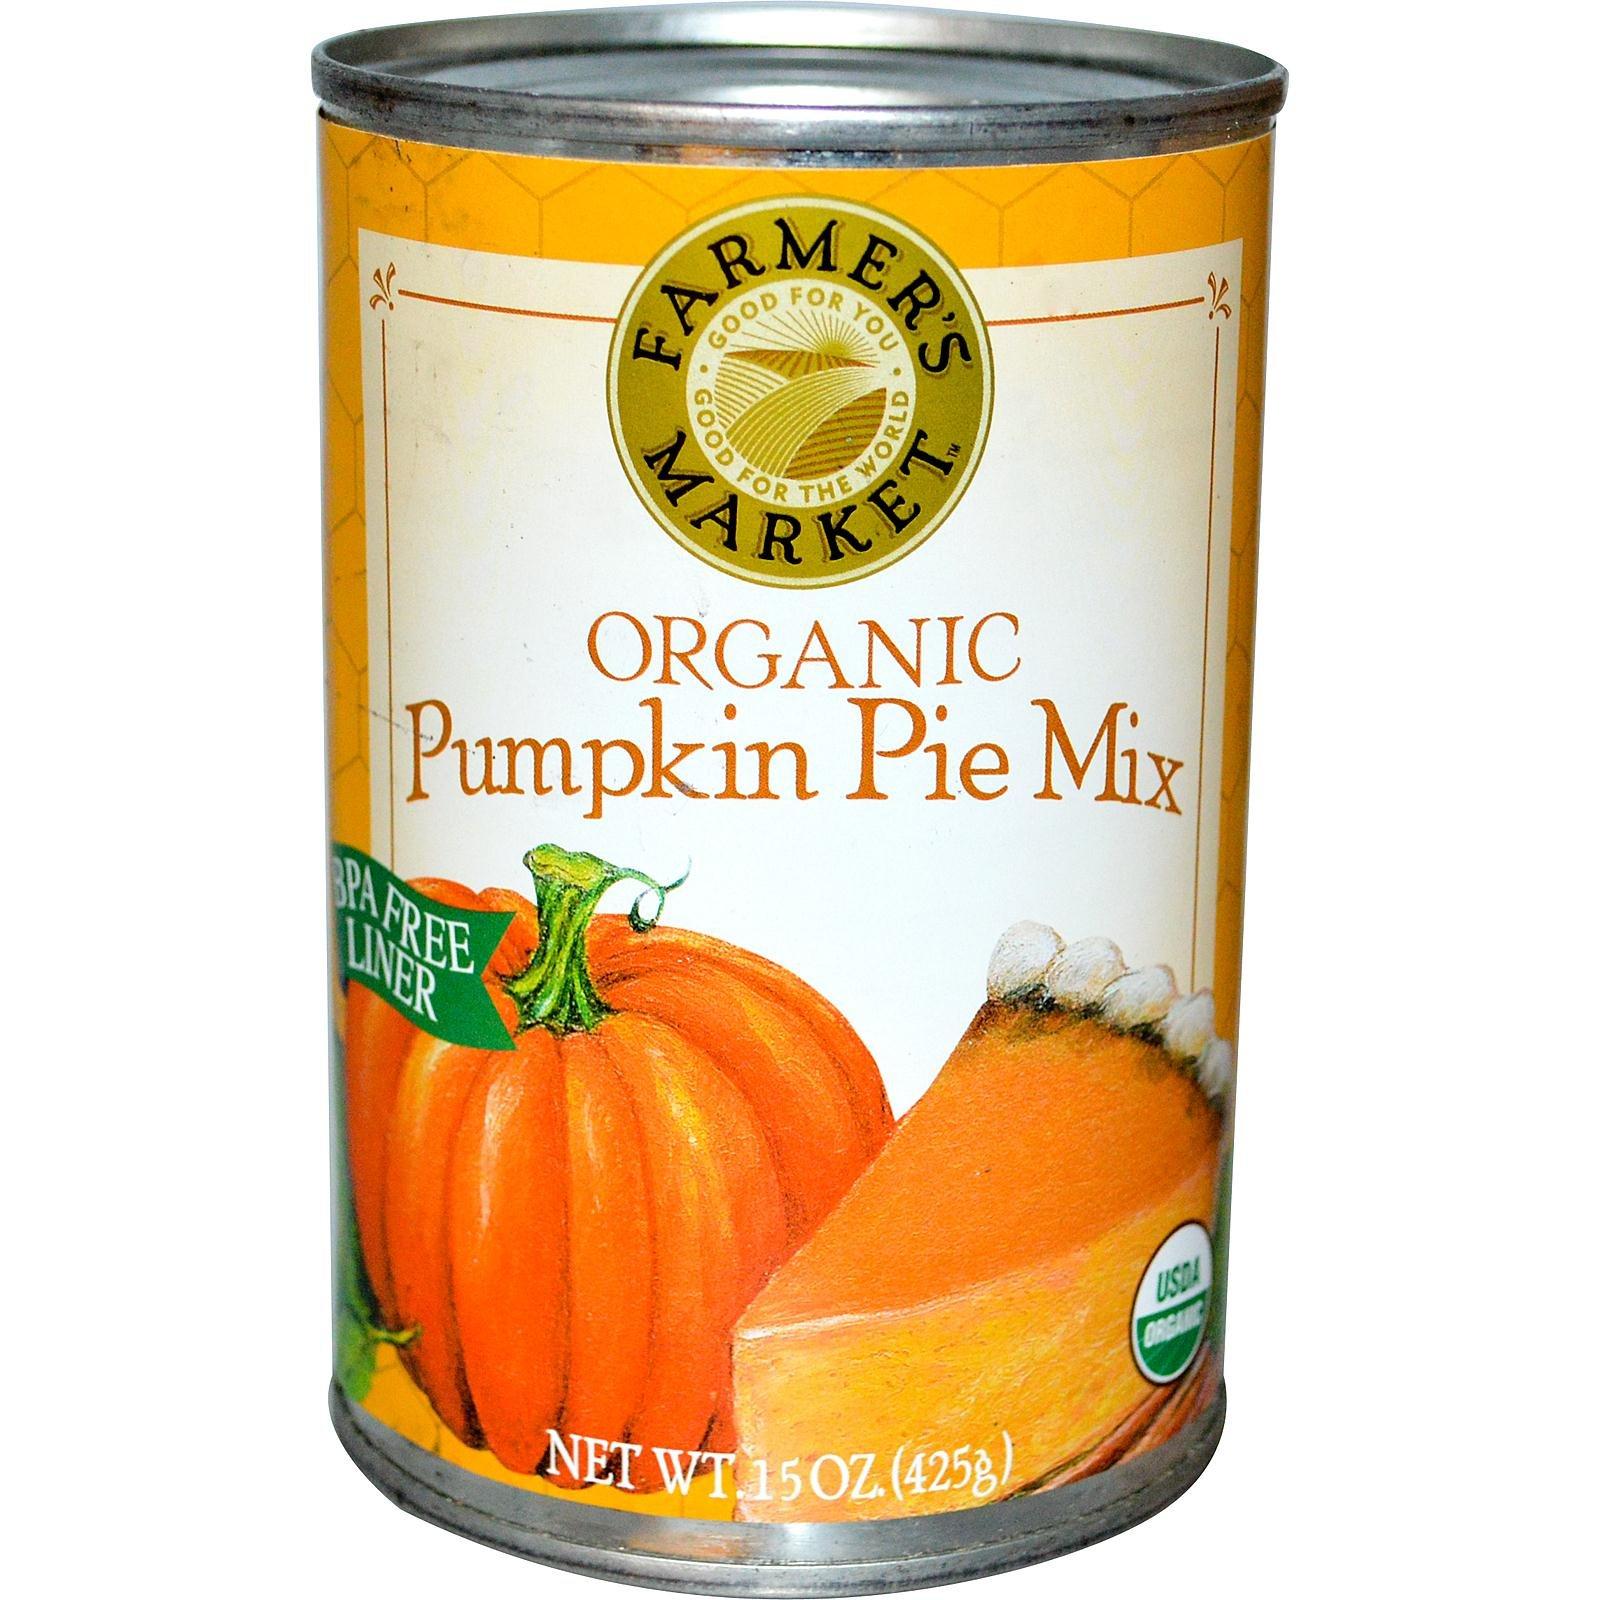 Farmer's Market Organic Canned Pumpkin Pie Mix, 15 Ounce (Pack of 12)